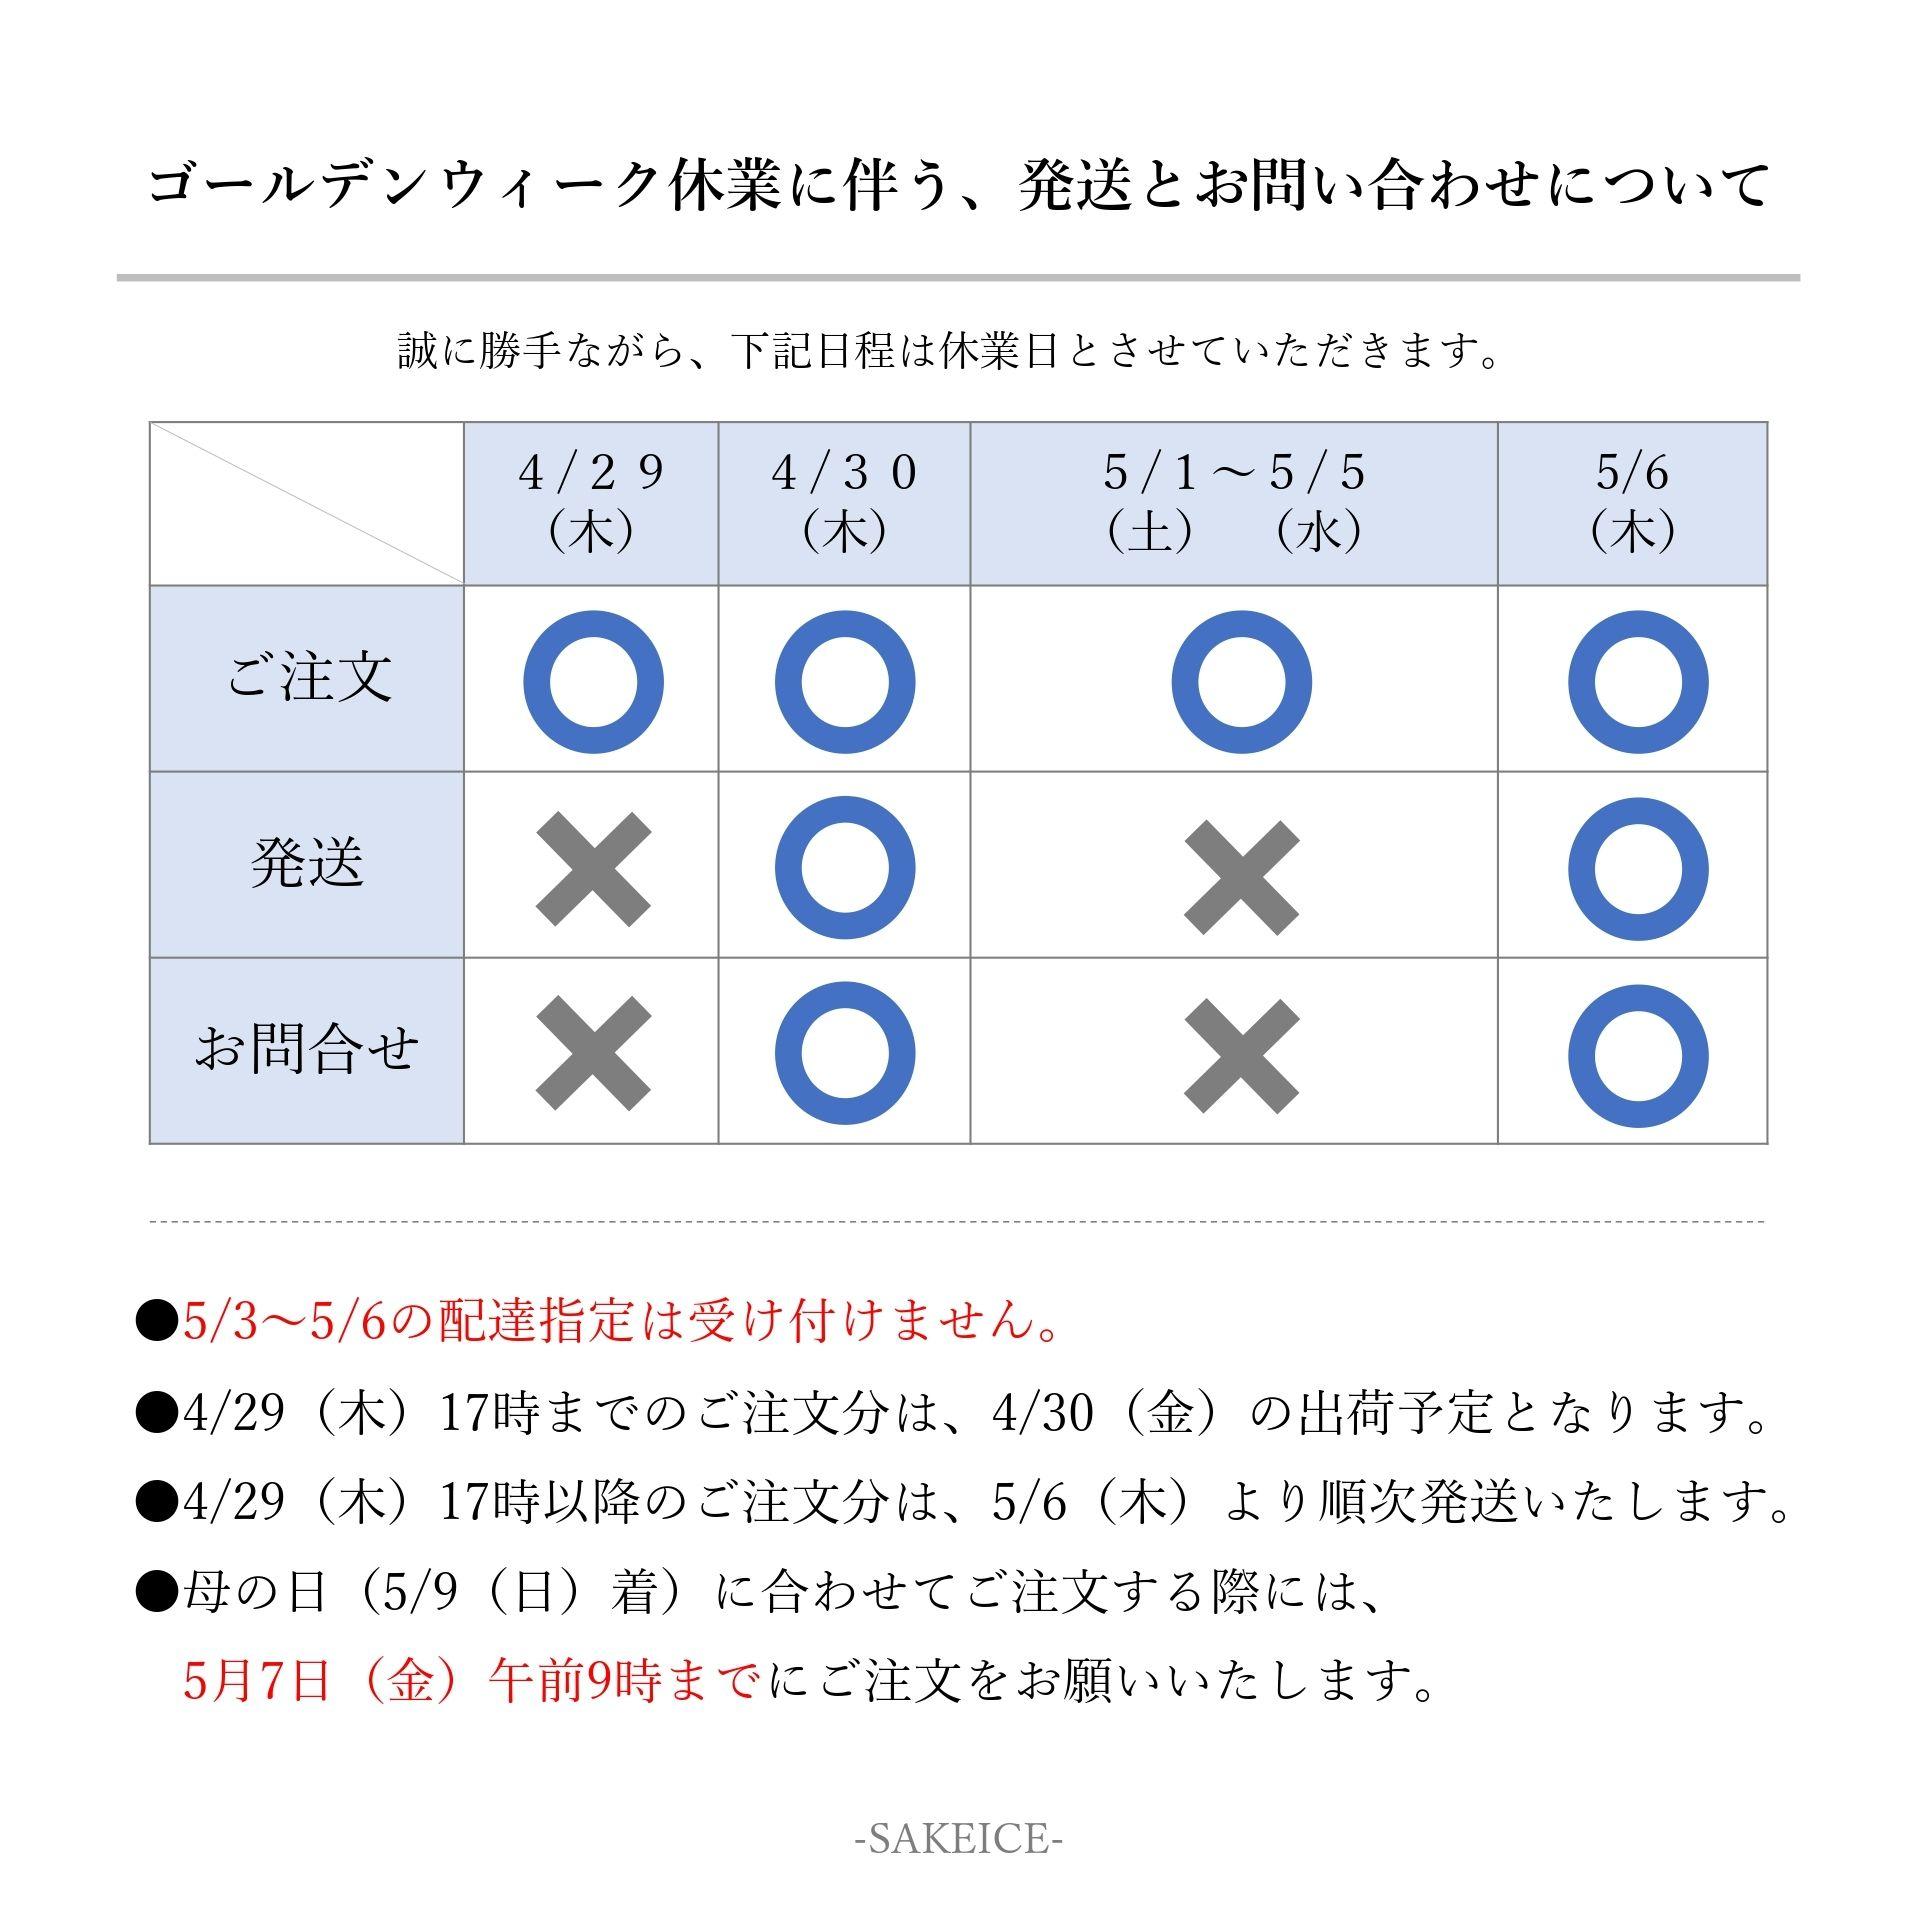 【GW】発送業務のお知らせ